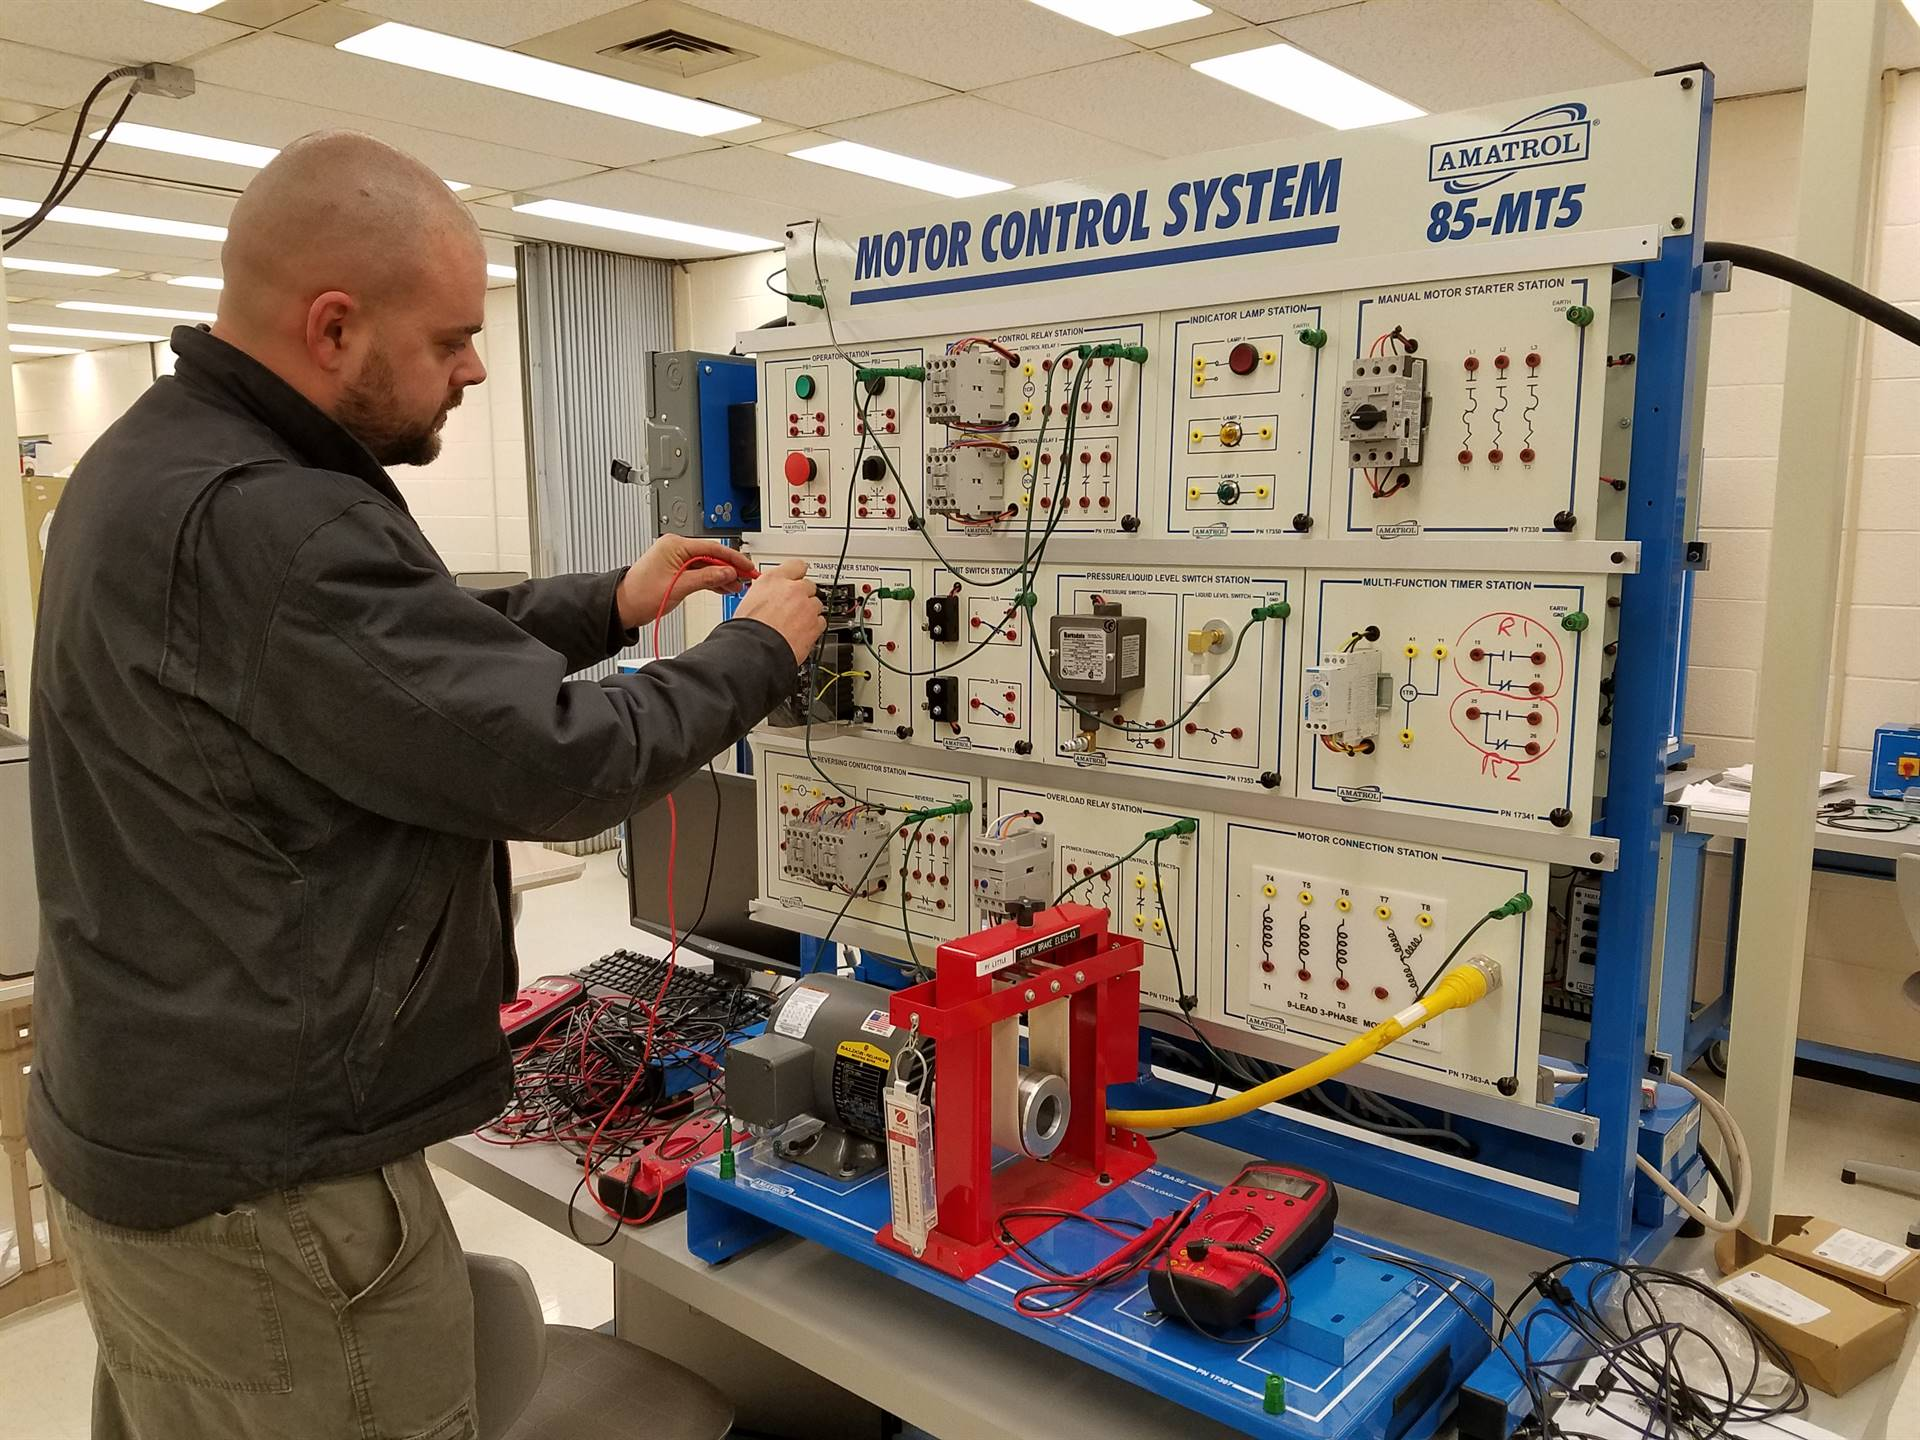 IMPAC - Motor Control System